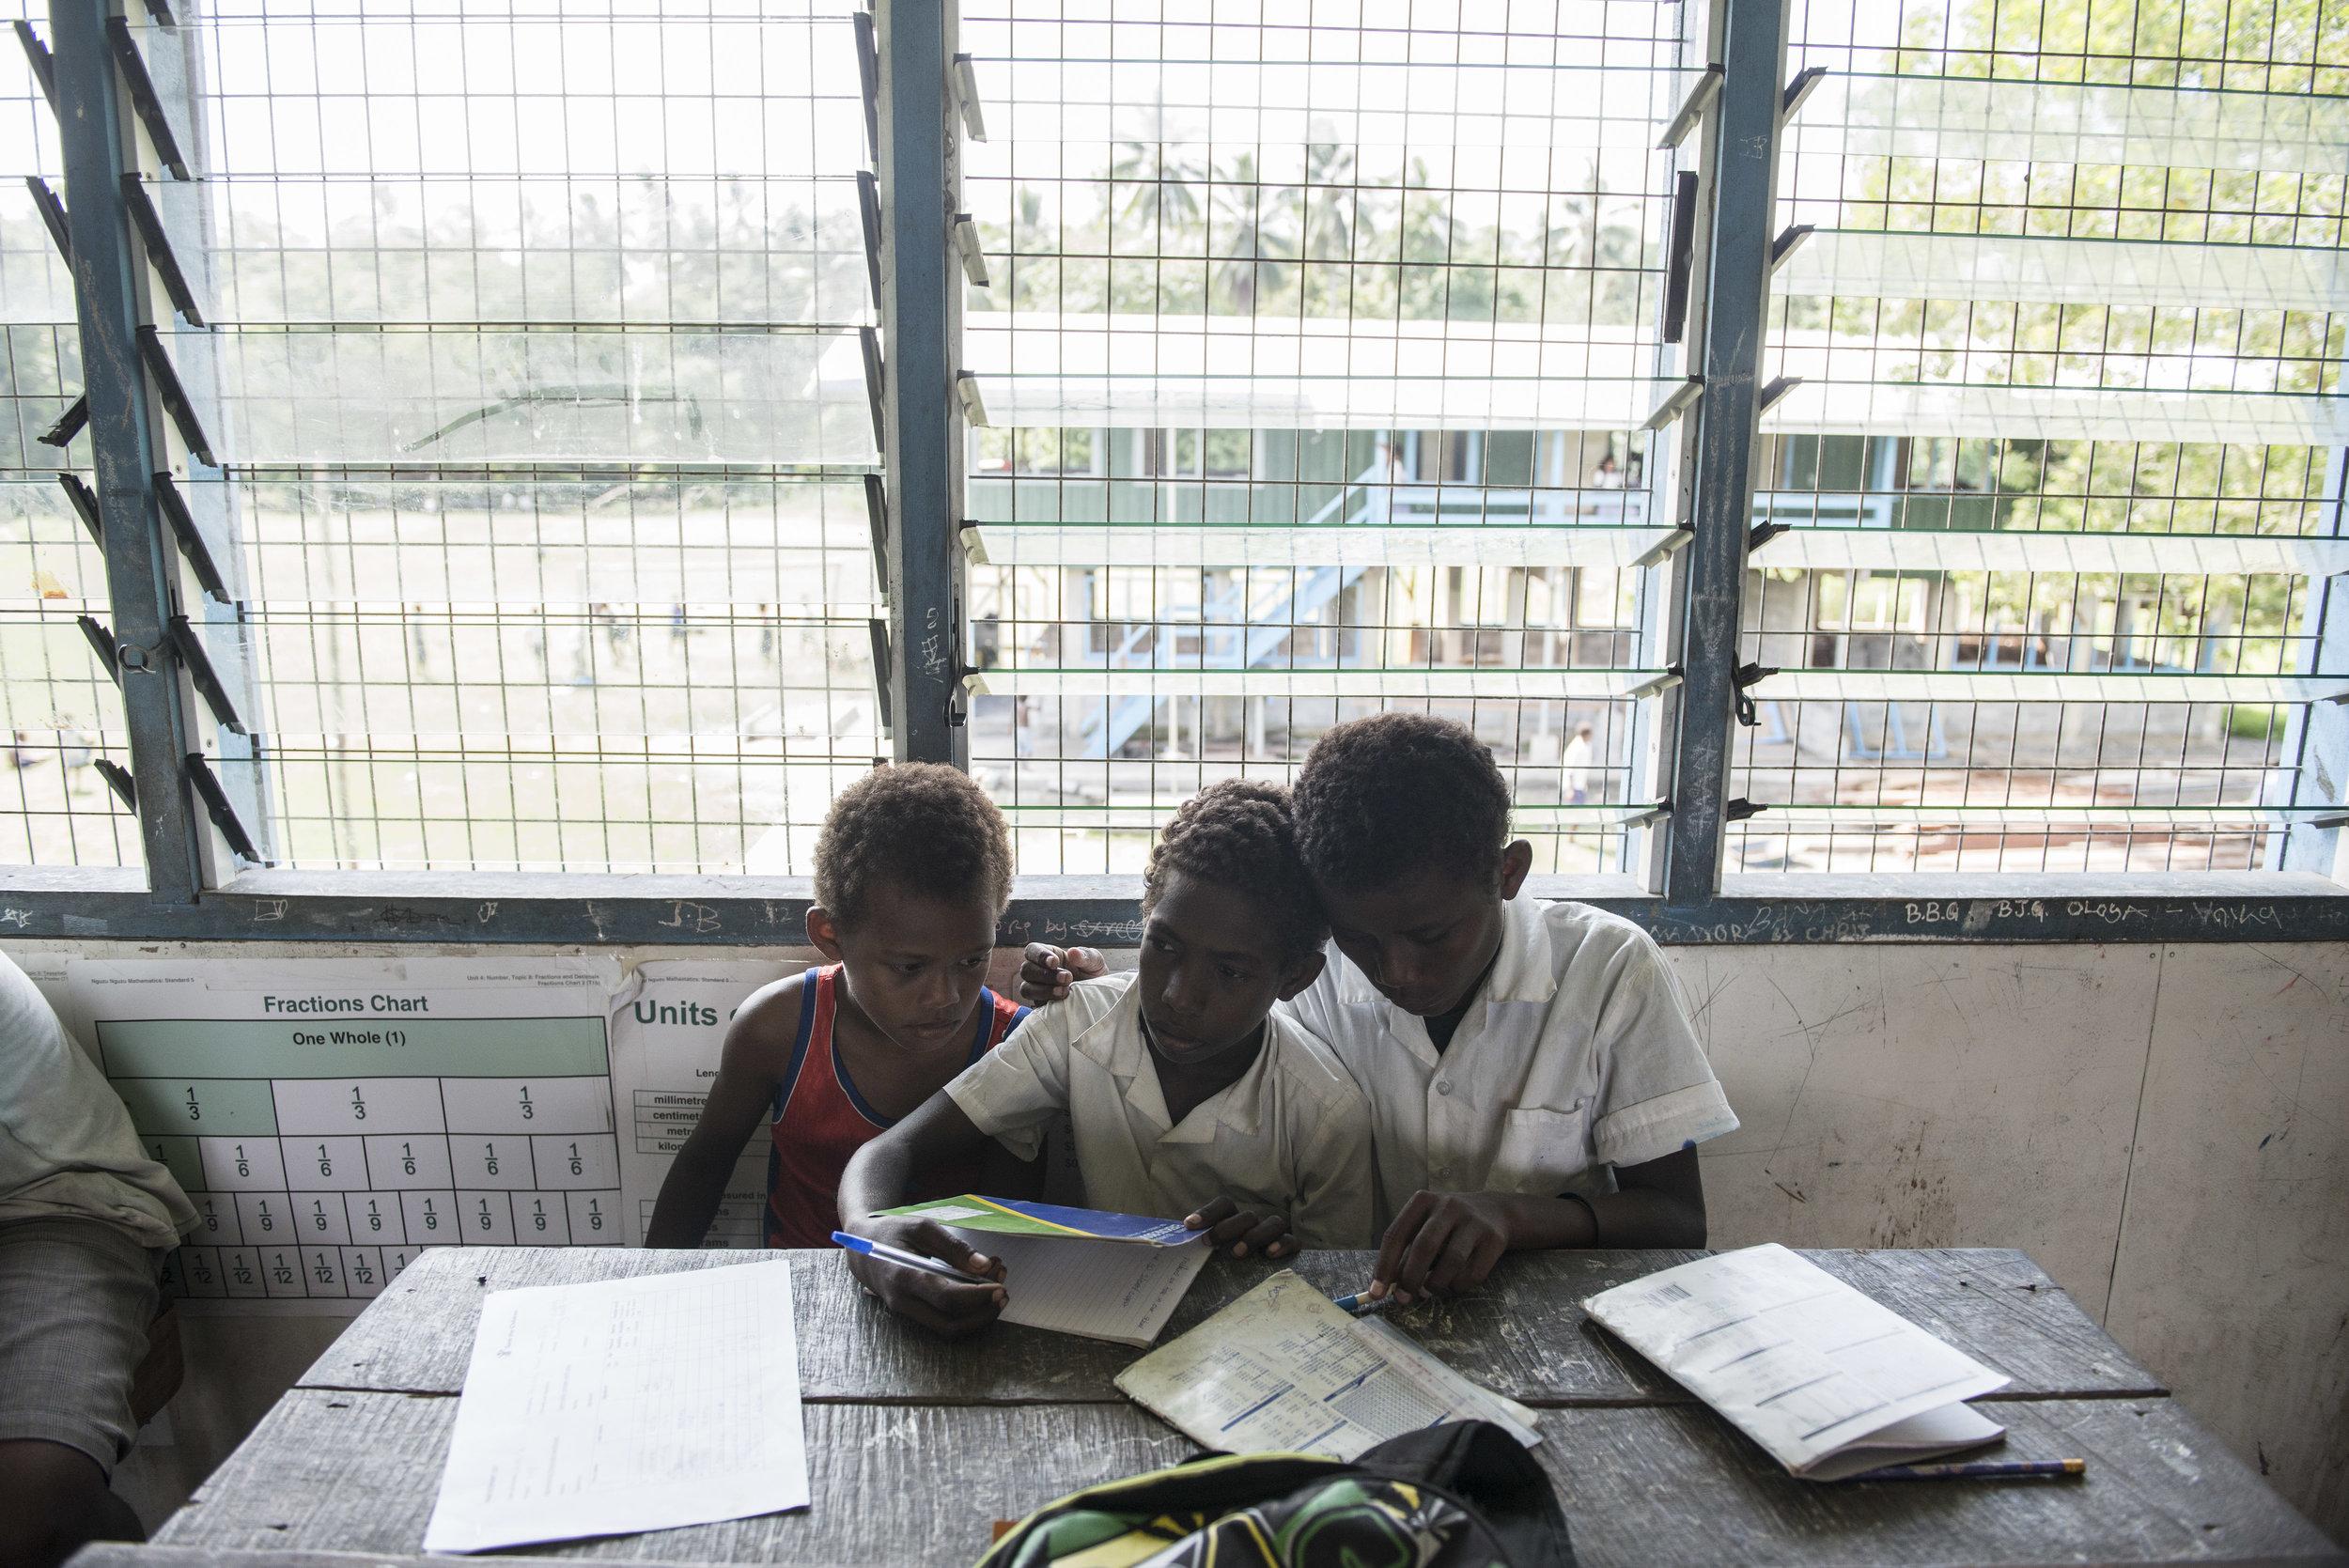 Child Protection project. Guadalcanal, Solomon Islands. 2016.